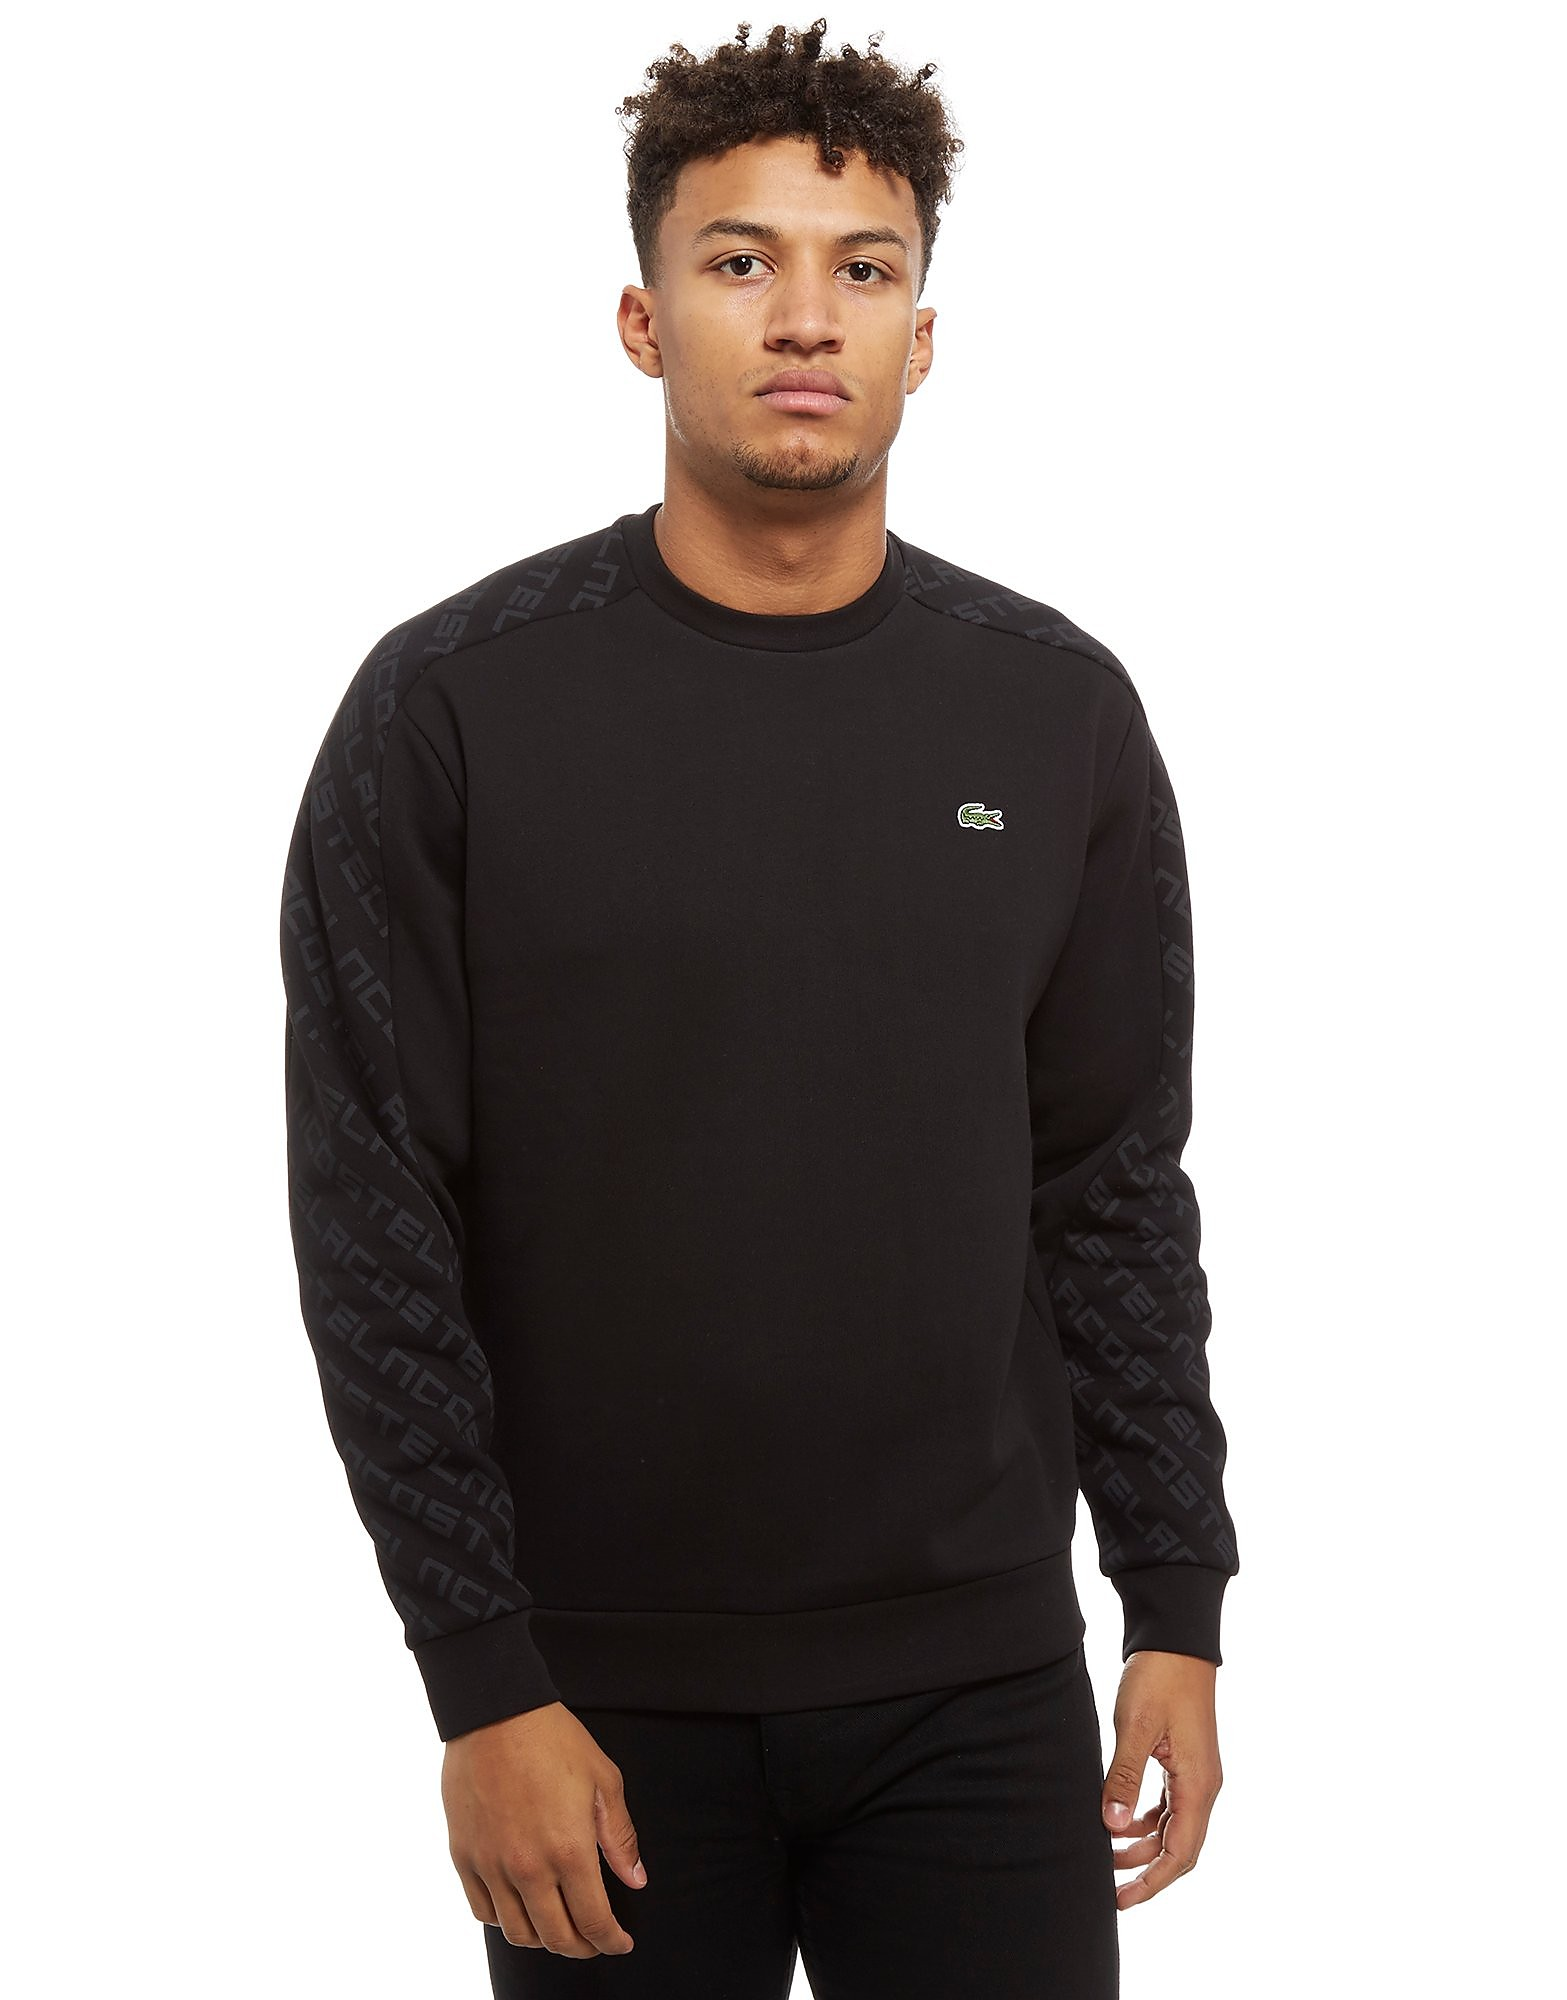 Lacoste Sleeve Print Crew Sweatshirt